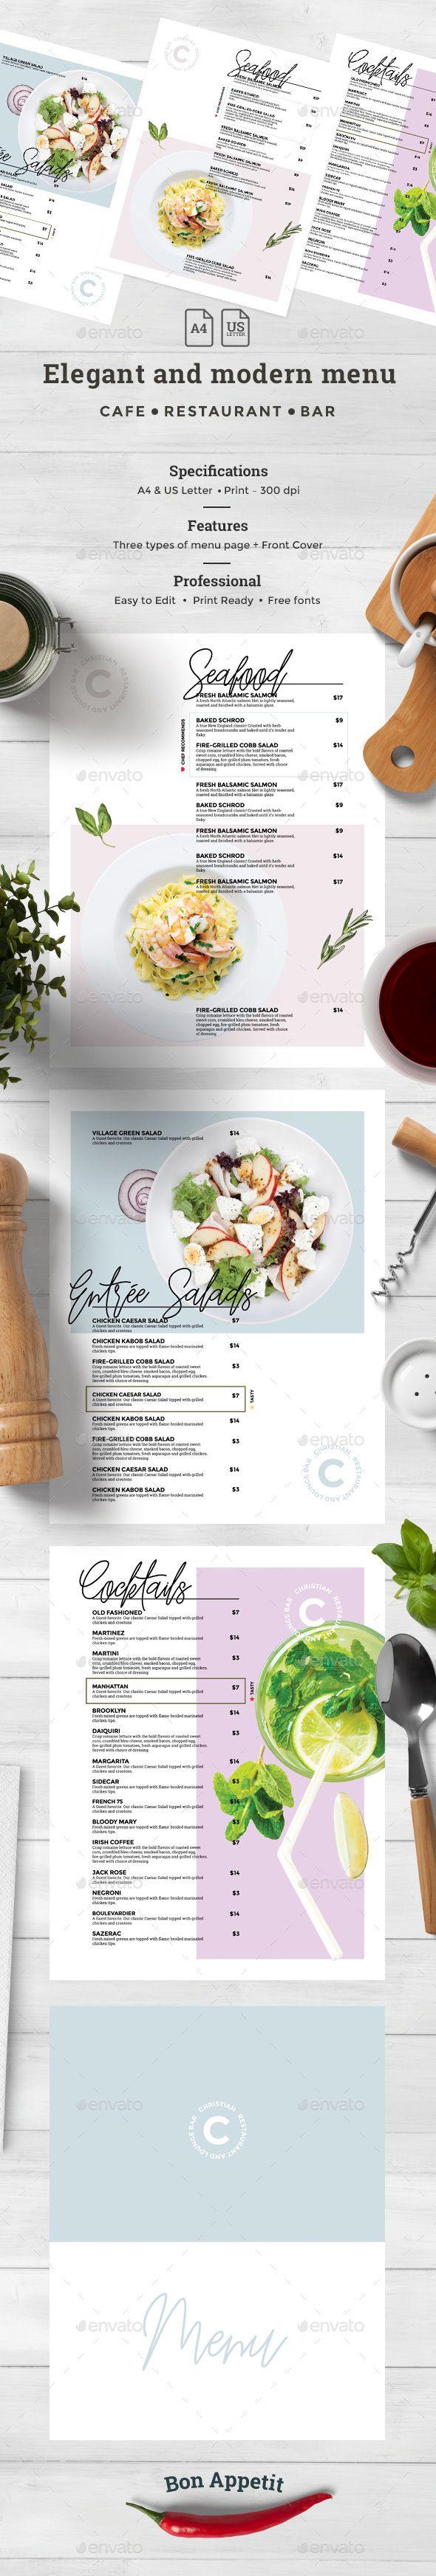 Simple Clean Food Menu Template - #Simple #Clean #Food #Menu #Template #Print #Design. Download here: https://graphicriver.net/item/food-menu/19525892?ref=yinkira